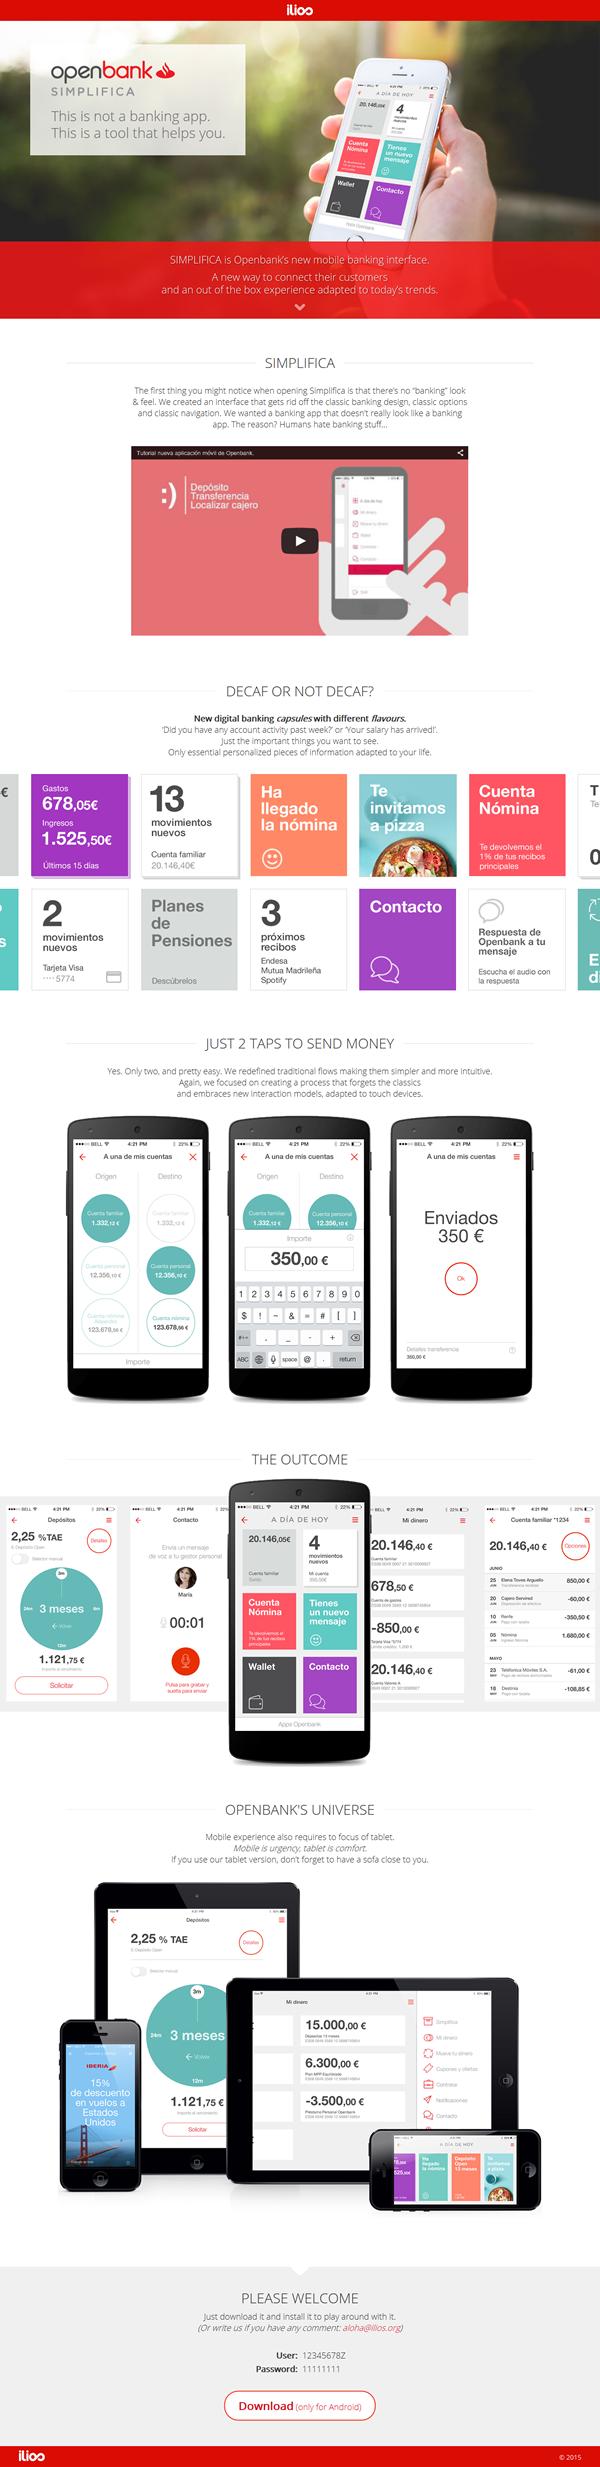 Infografia App Openbank Illios